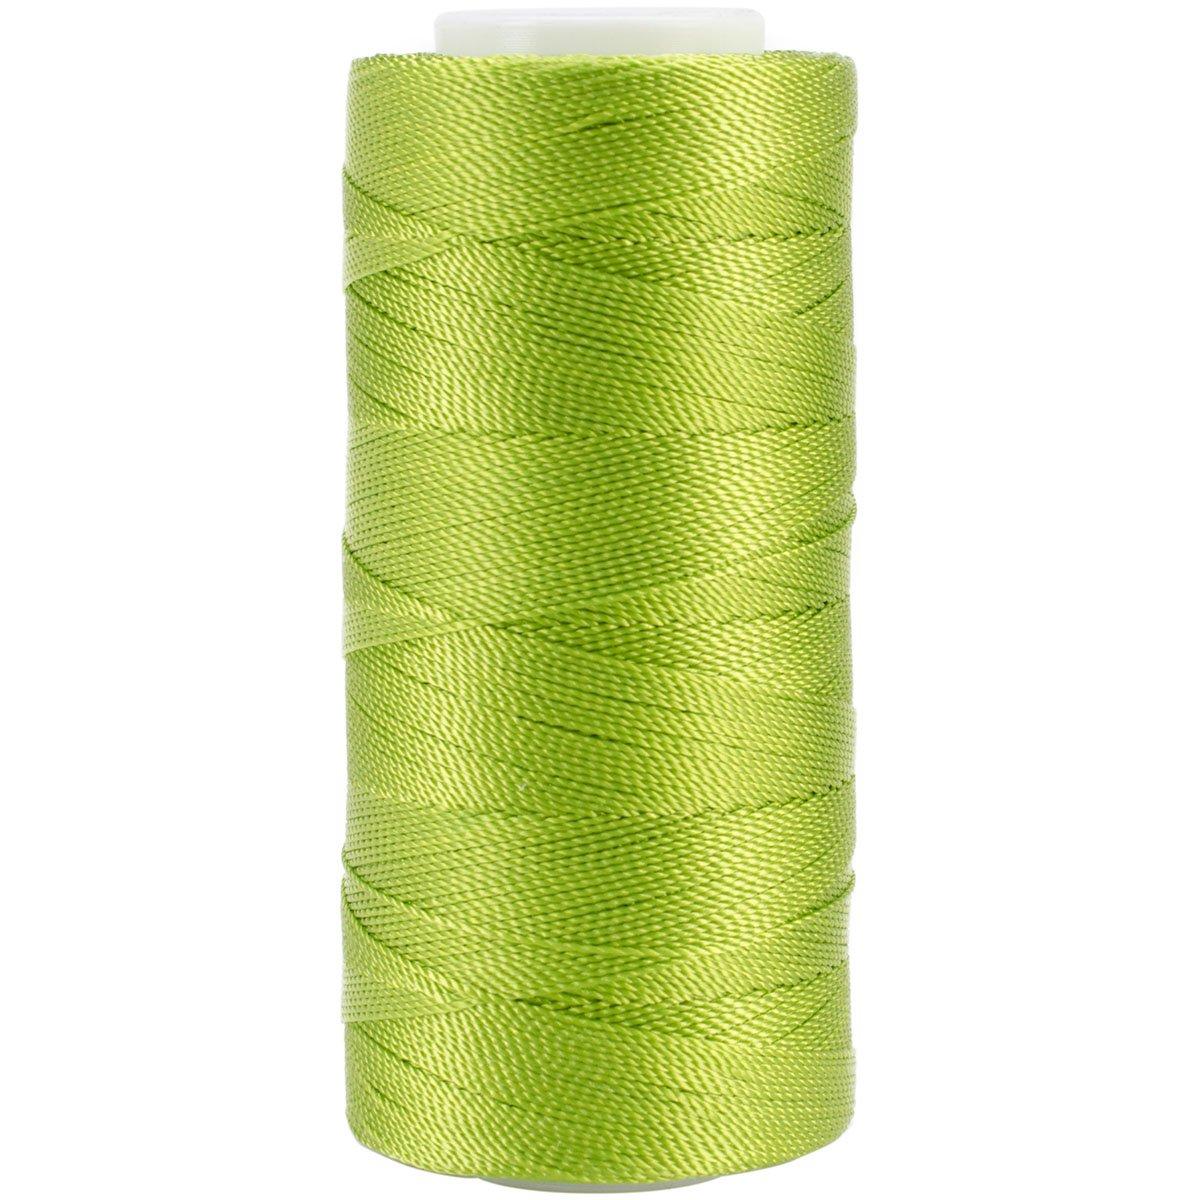 Iris 2-471 Nylon Crochet Thread, 300-Yard, Lime